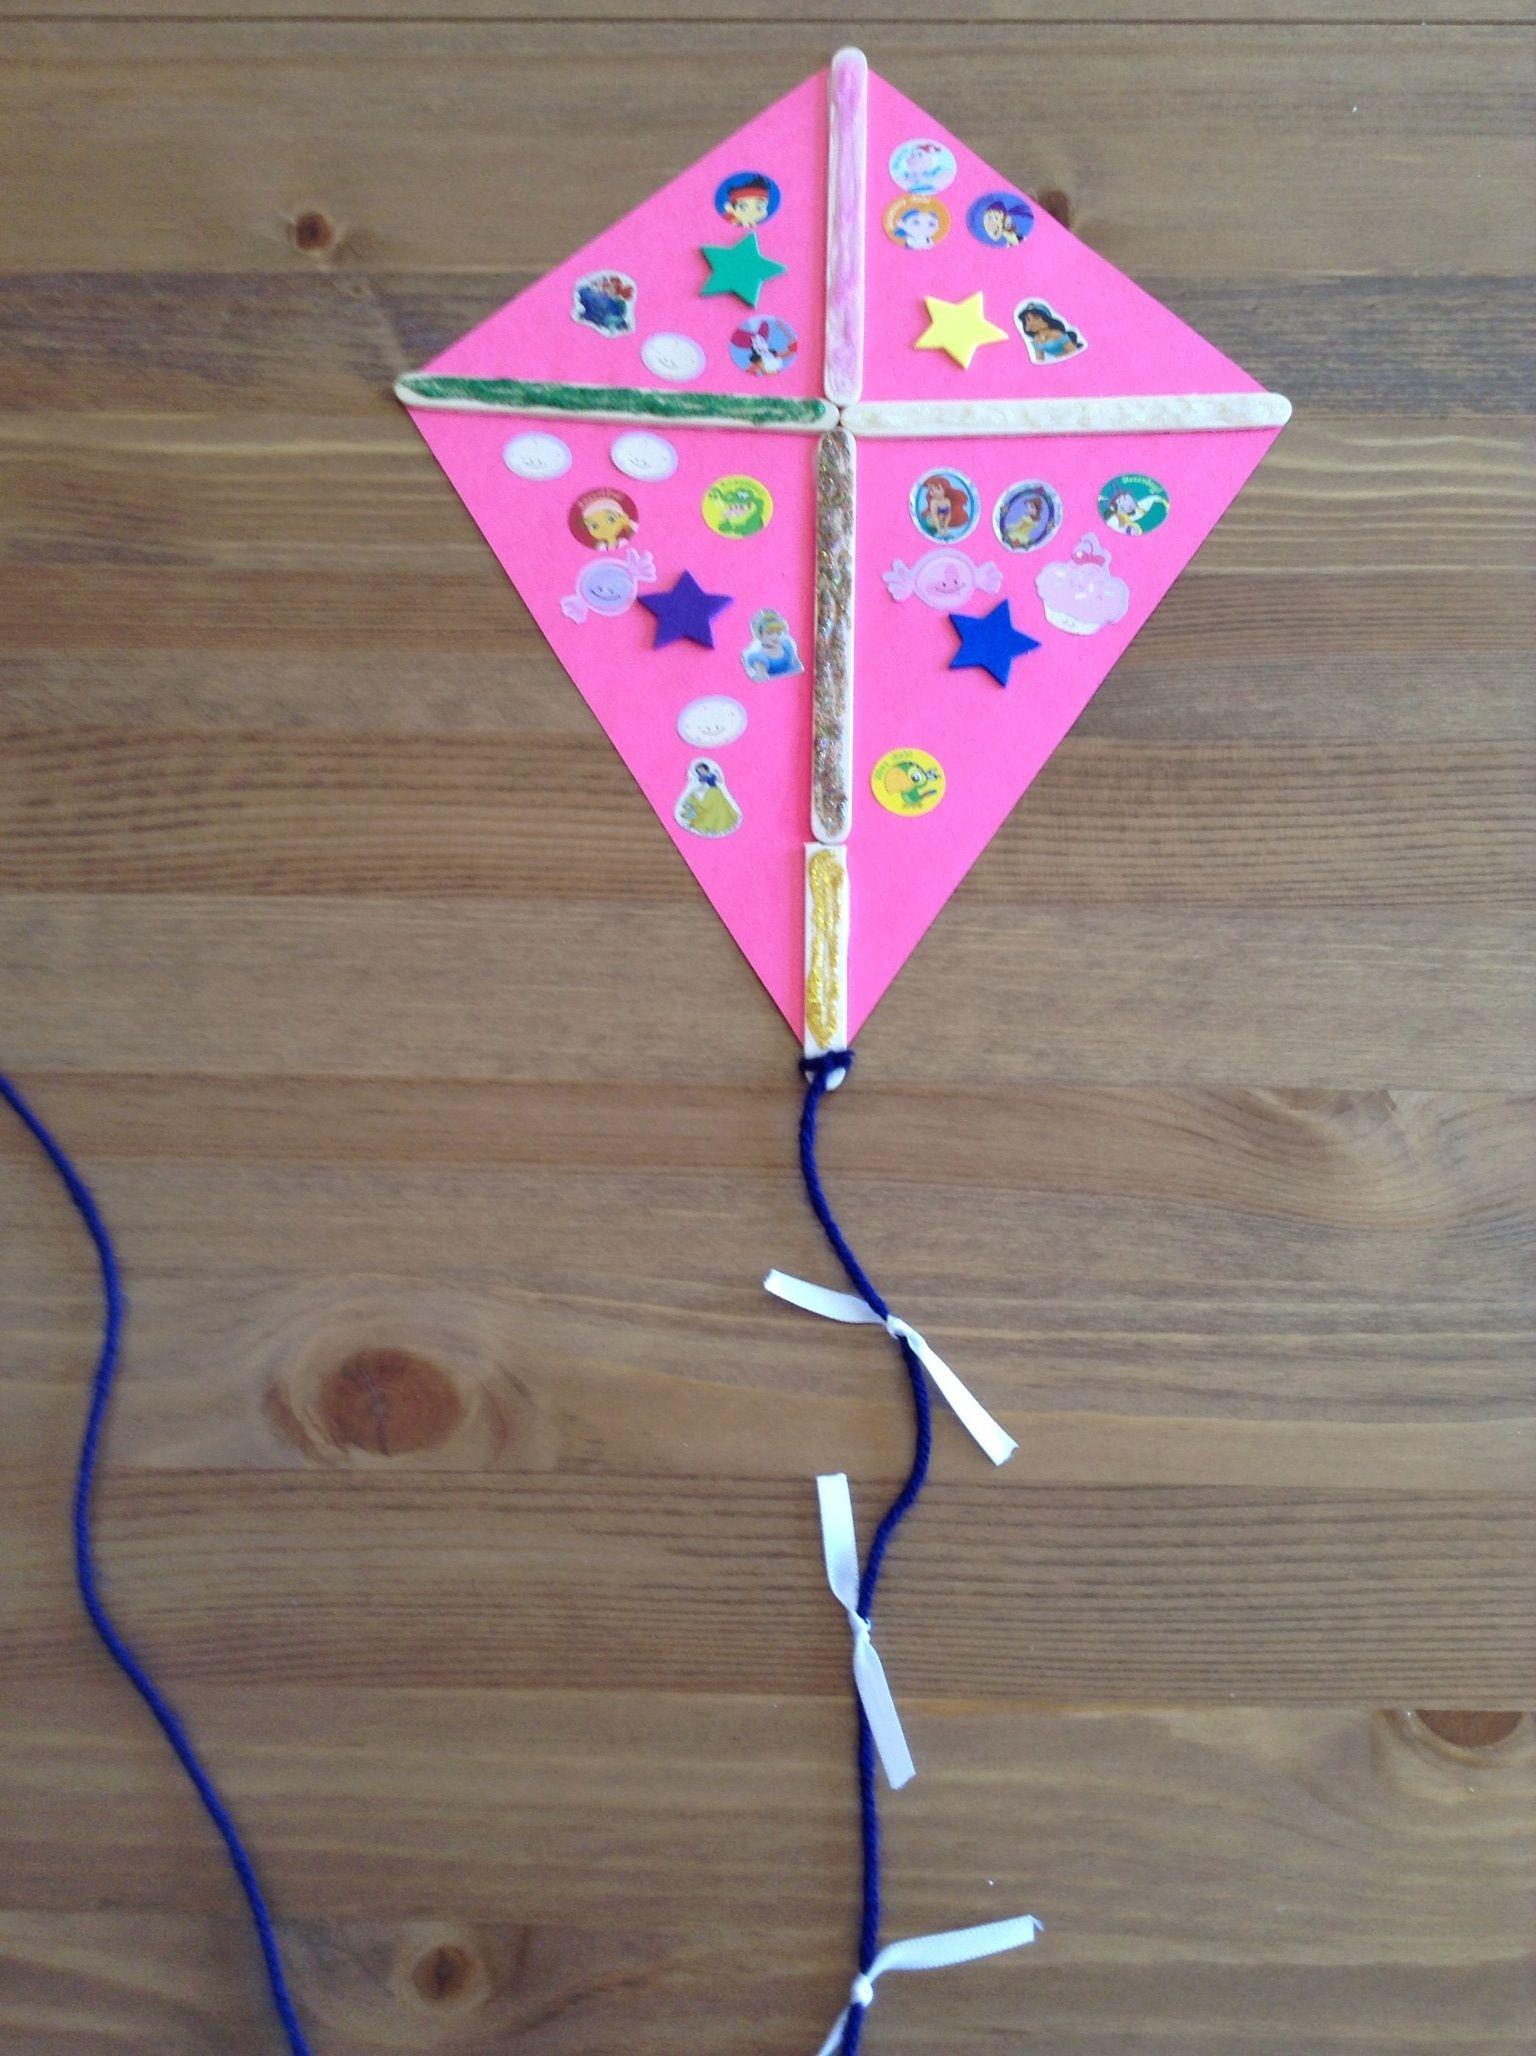 kite craft www amommysadventures com crafts kites preschool